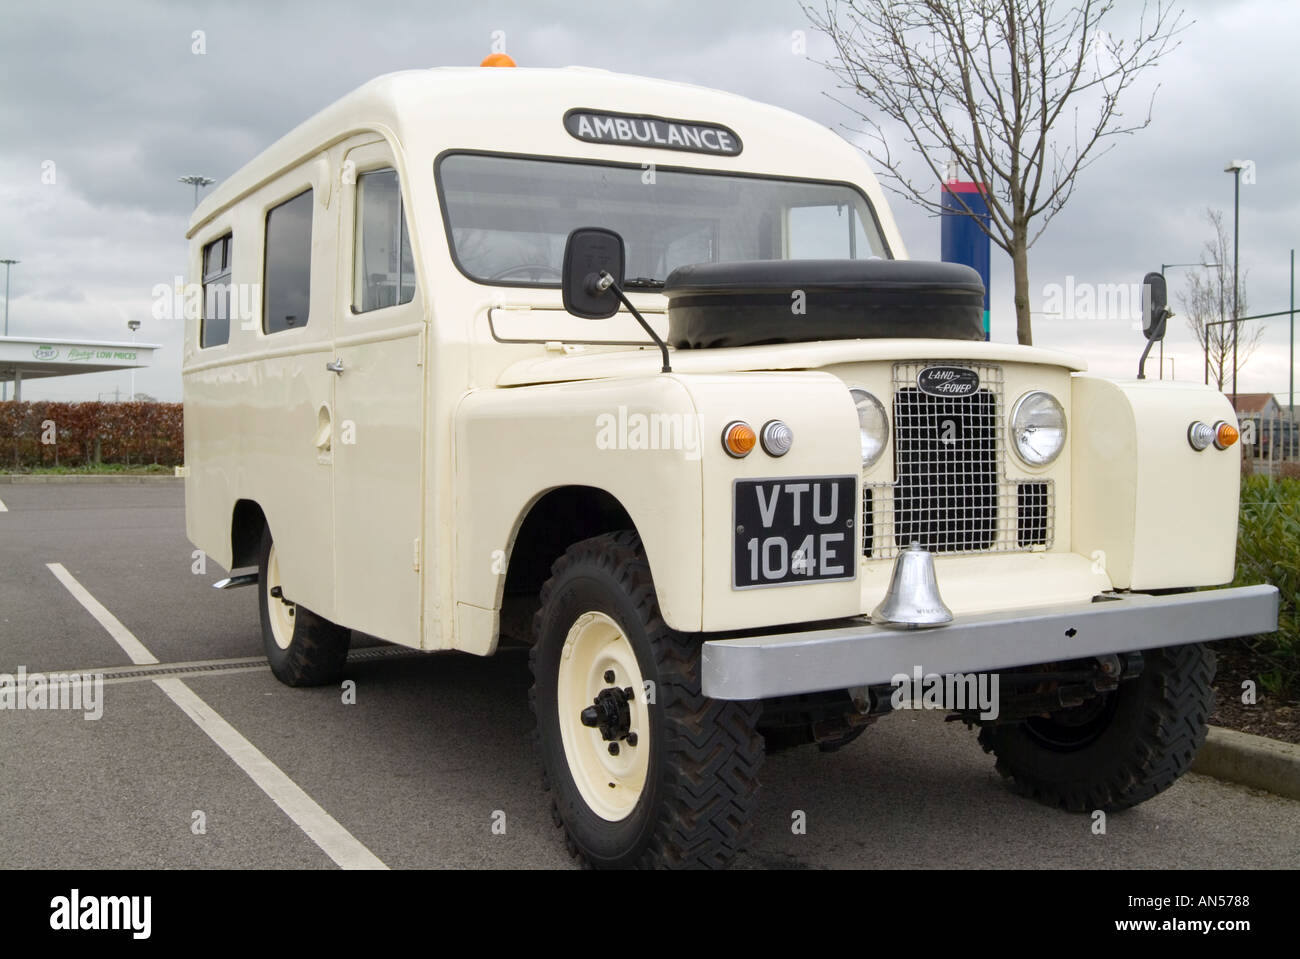 https://c8.alamy.com/comp/AN5788/classic-land-rover-ambulance-car-4-4-four-by-four-four-wheel-drive-AN5788.jpg